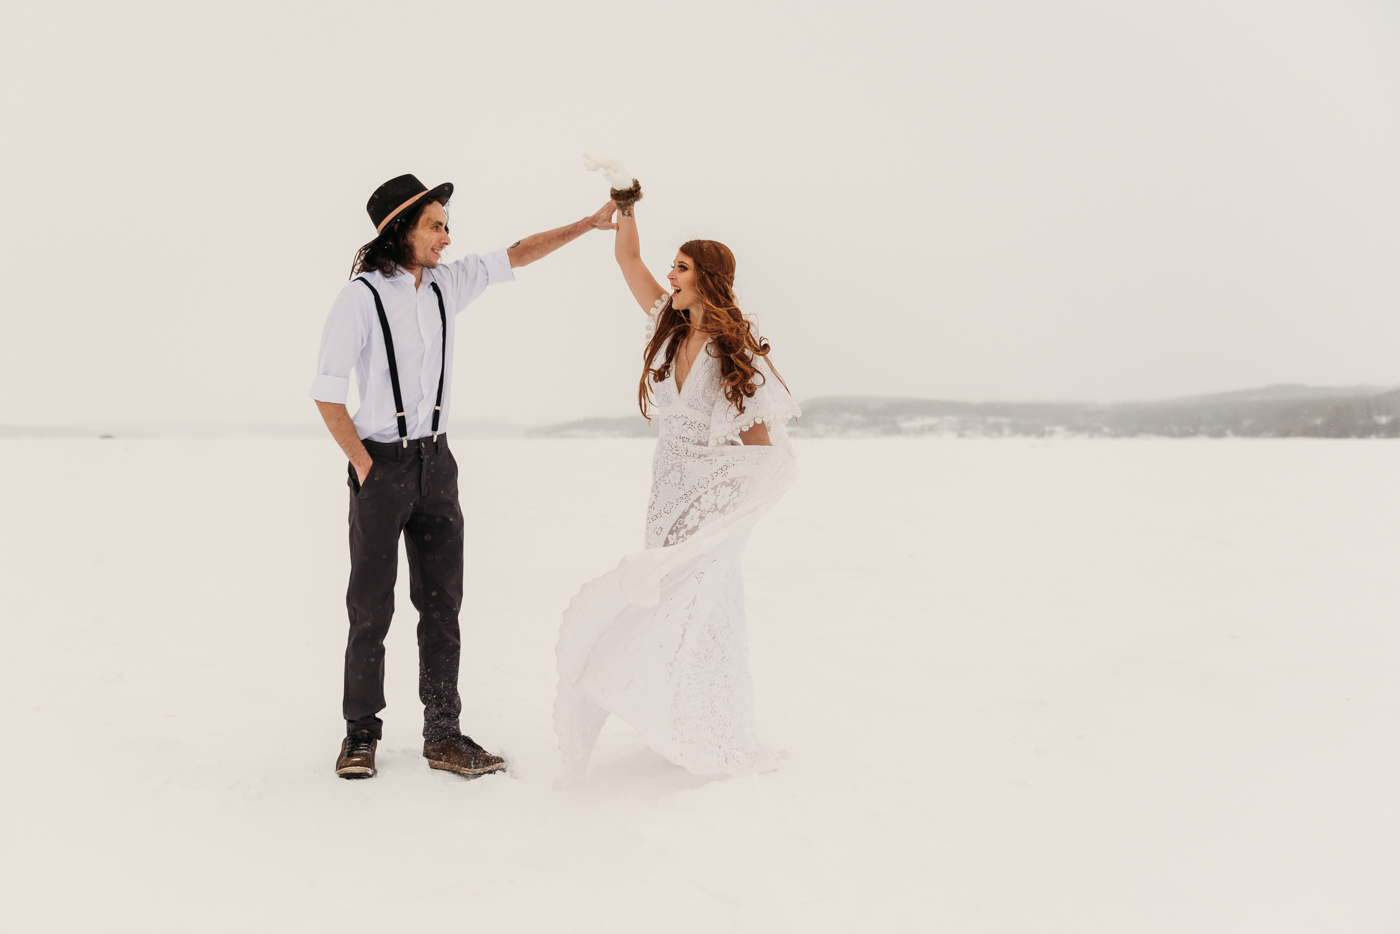 FortSt.John_photographer_TyraEPhotography_Wedding_Couple_Family_Photograhy_DawsonCreek_Elopement_Bride_Boduoir_Portraits-8.jpg